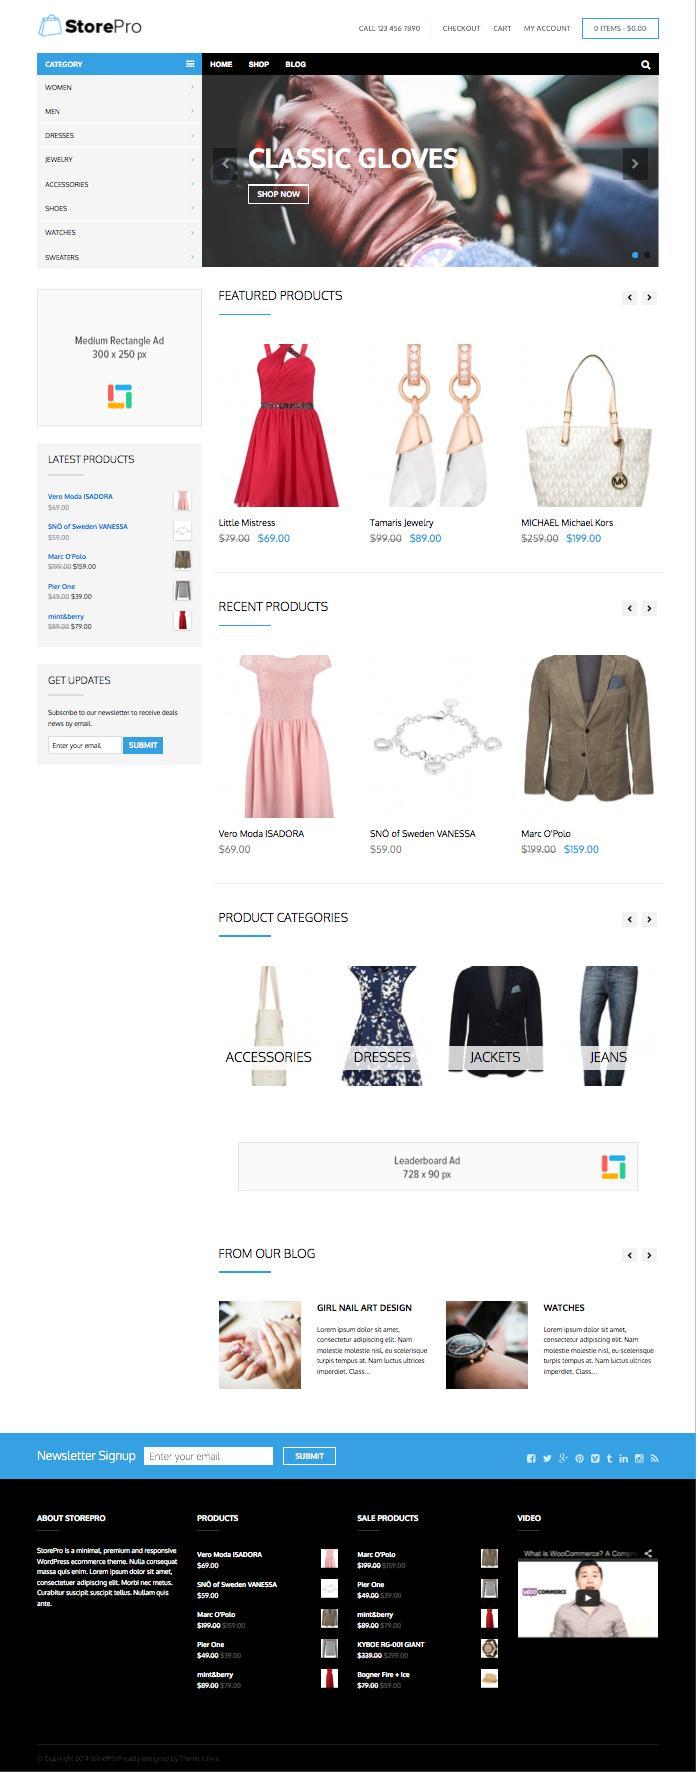 StorePro WordPress eCommerce Product Theme